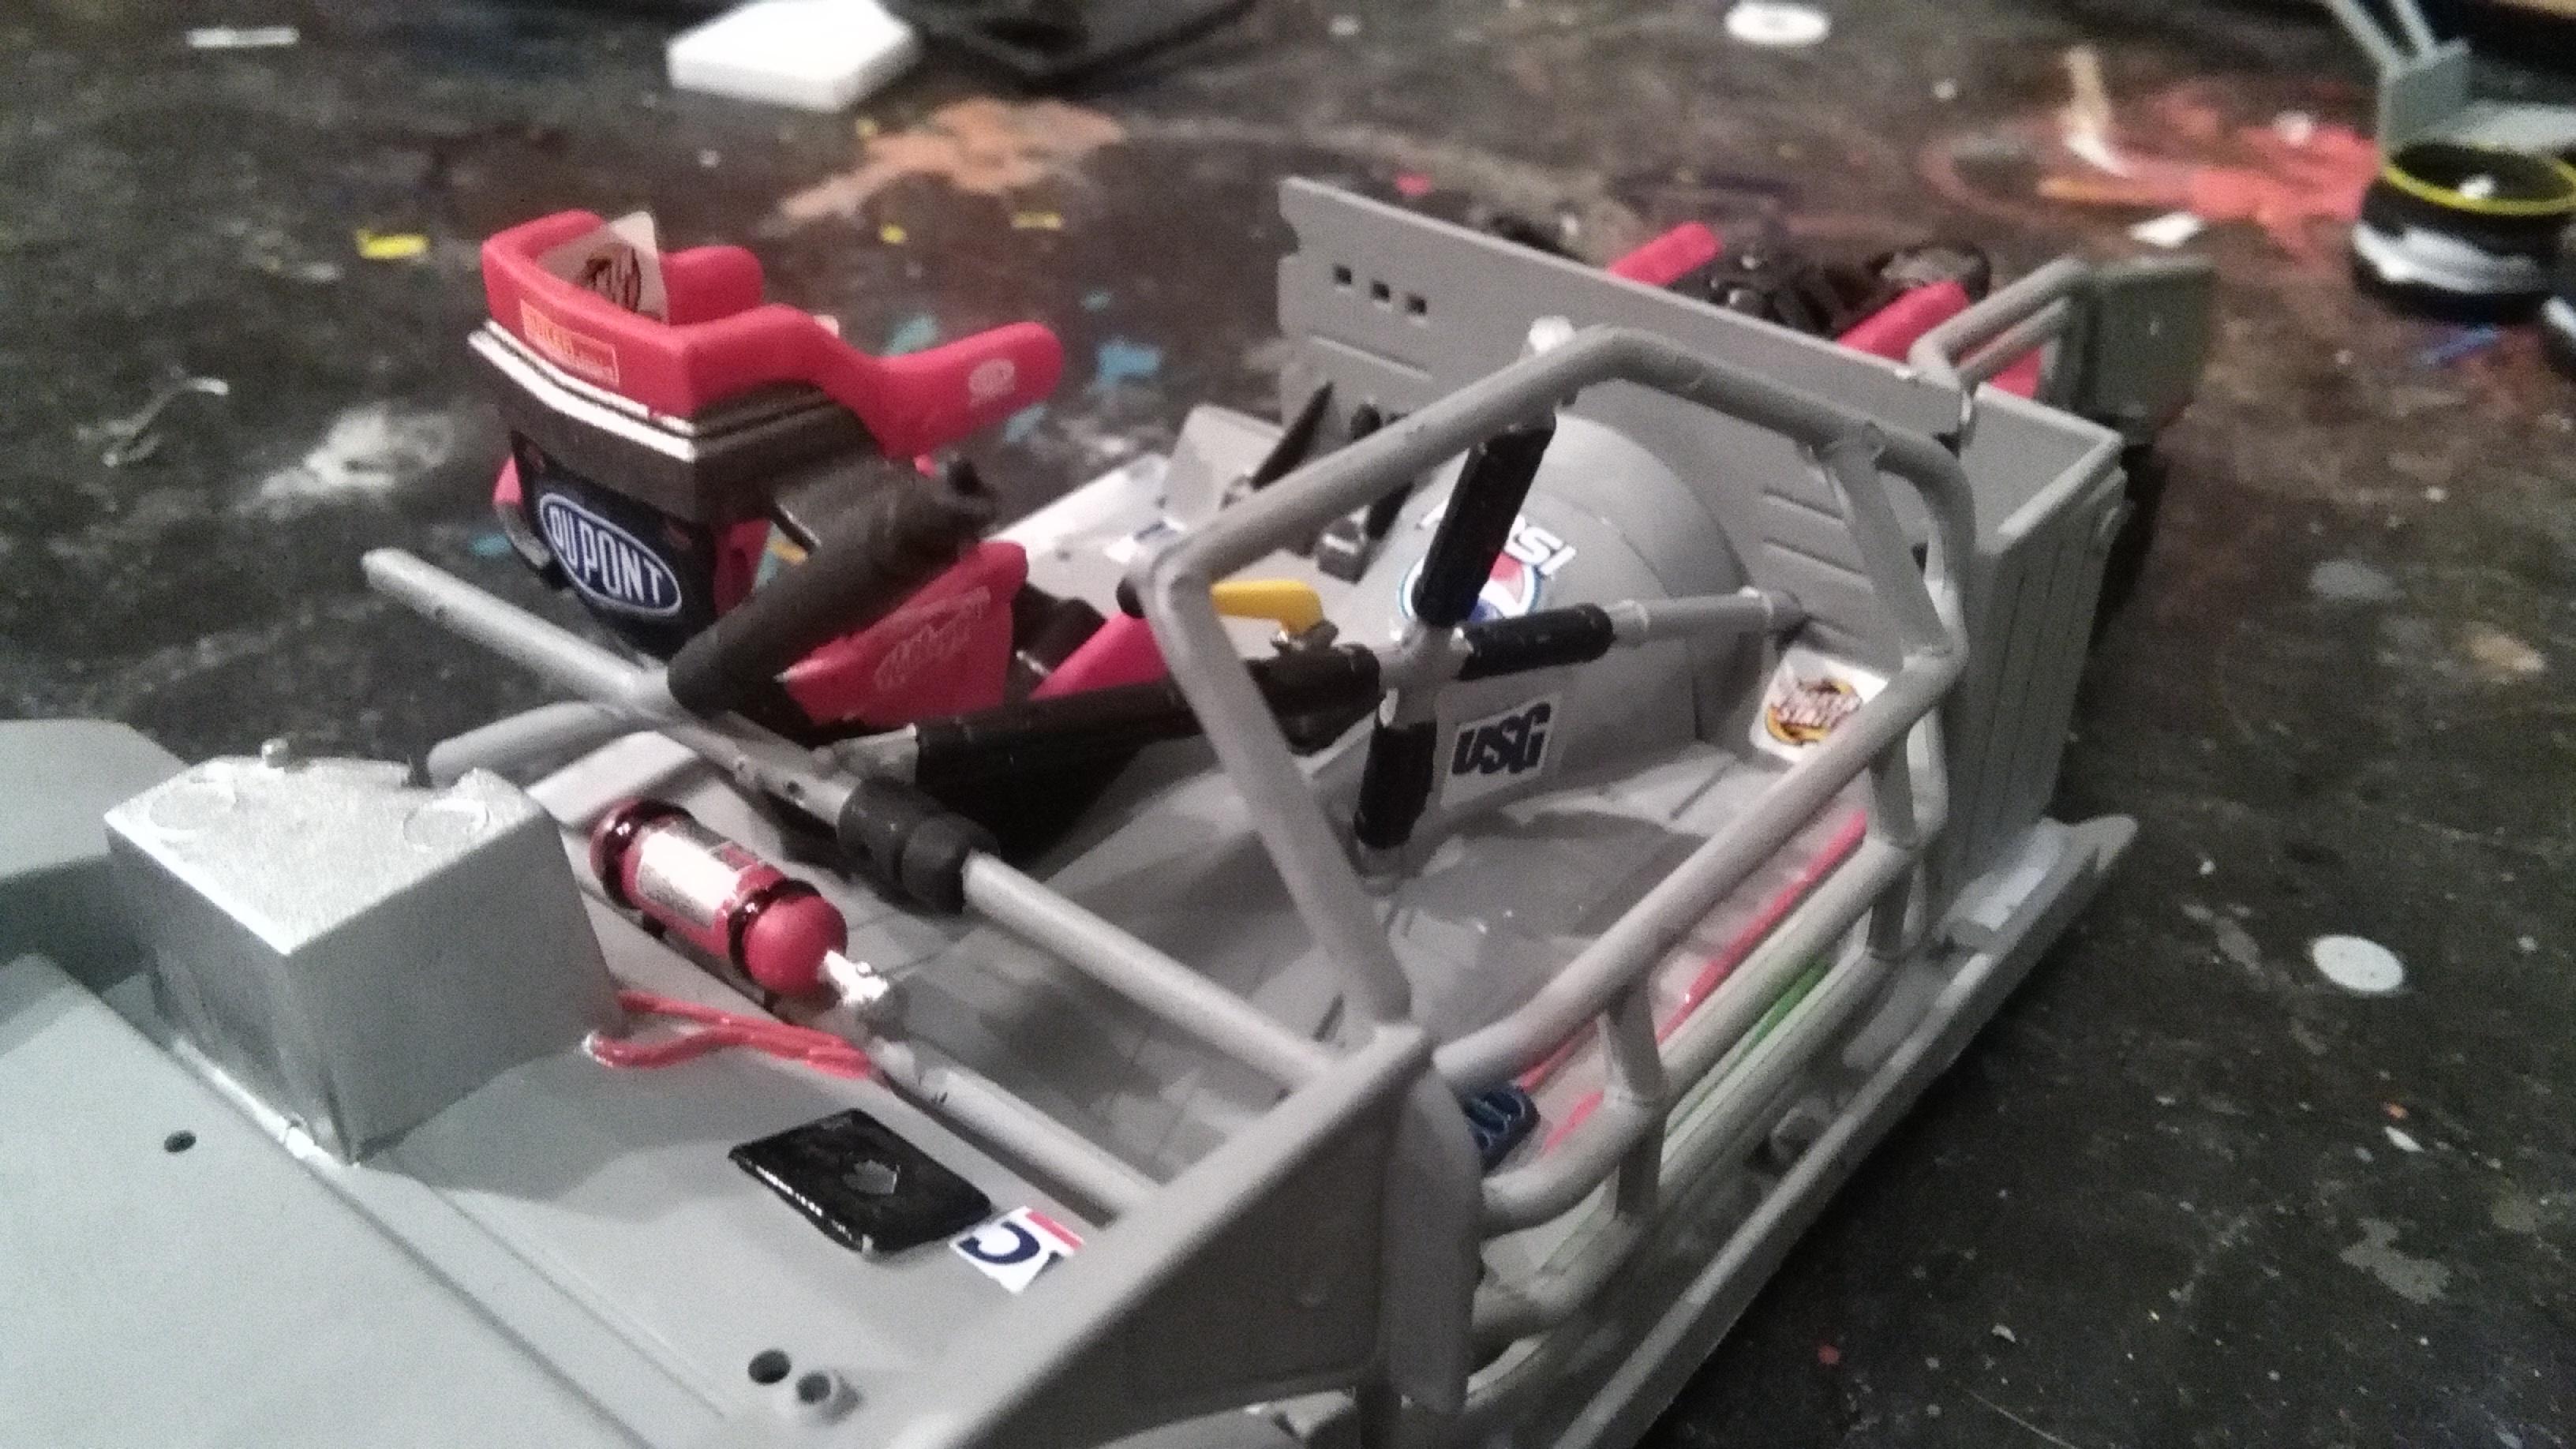 Chevy Monte-Carlo 2005 #24 Jeff Gordon Pepsi/Star Wars  833884IMG20170422230130